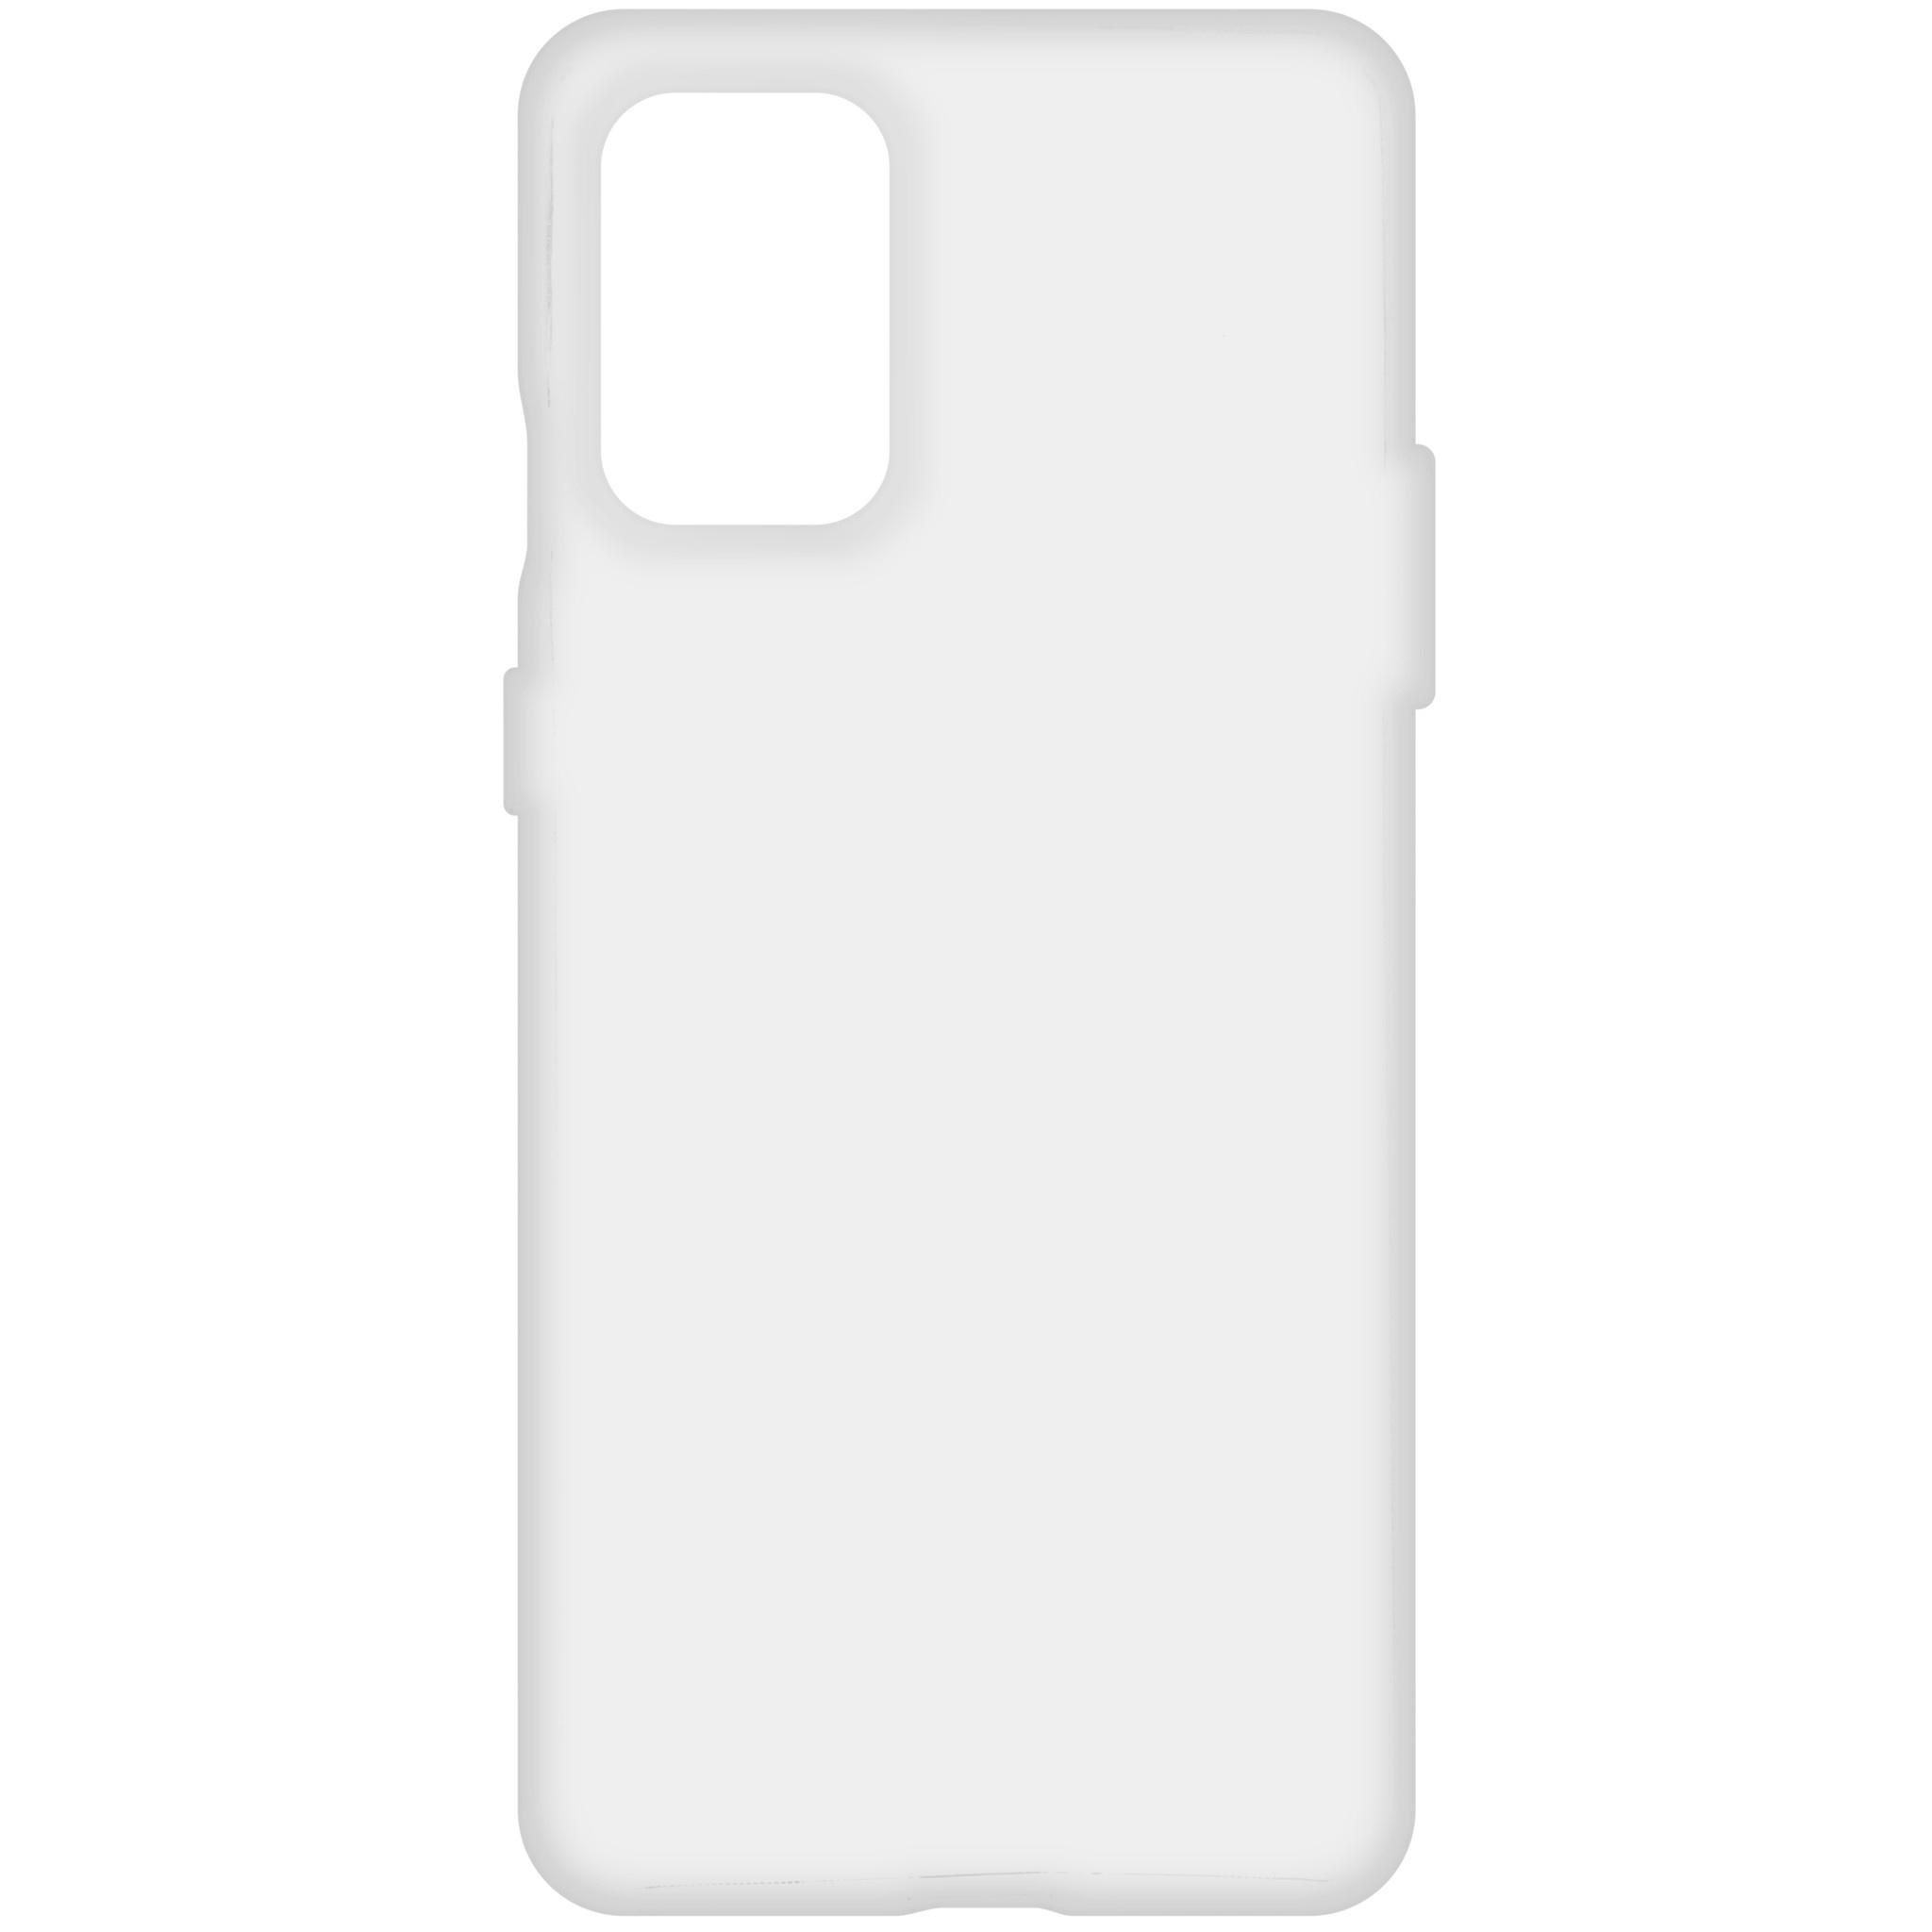 iMoshion Coque silicone OnePlus 8T - Transparent